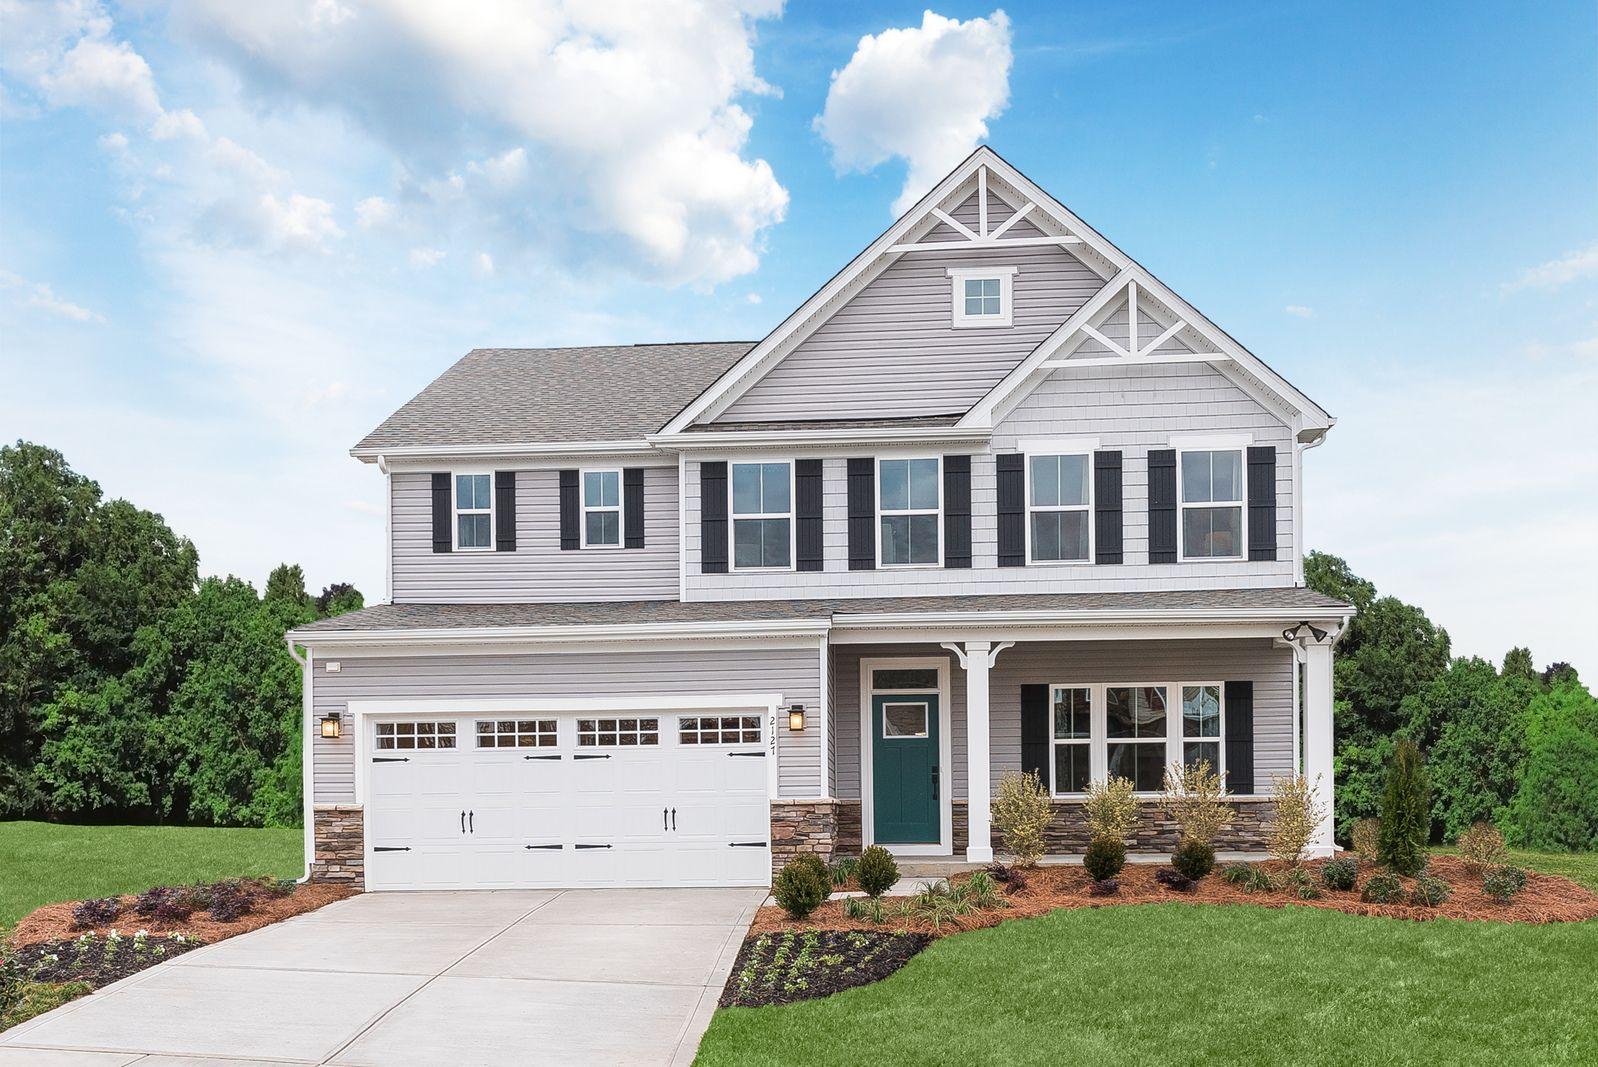 Ryan Homes at Nichols Vale - New Homesites Coming Soon